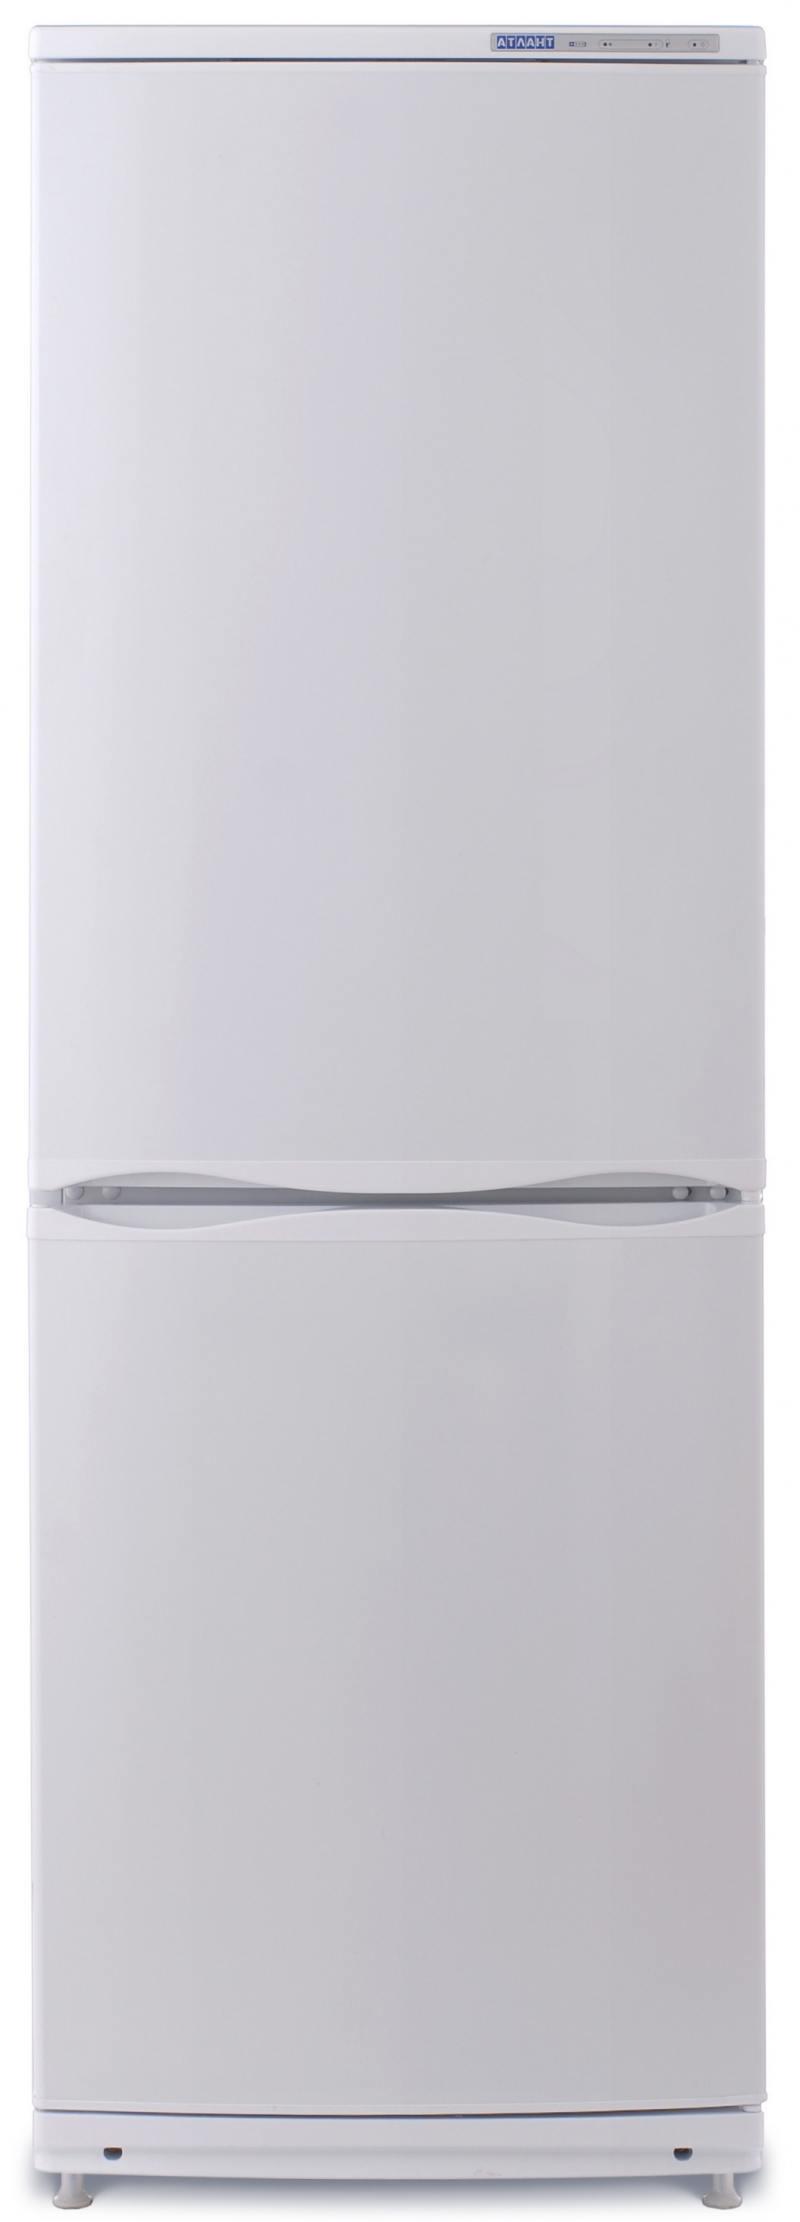 купить Холодильник ATLANT 4012-022 по цене 18790 рублей